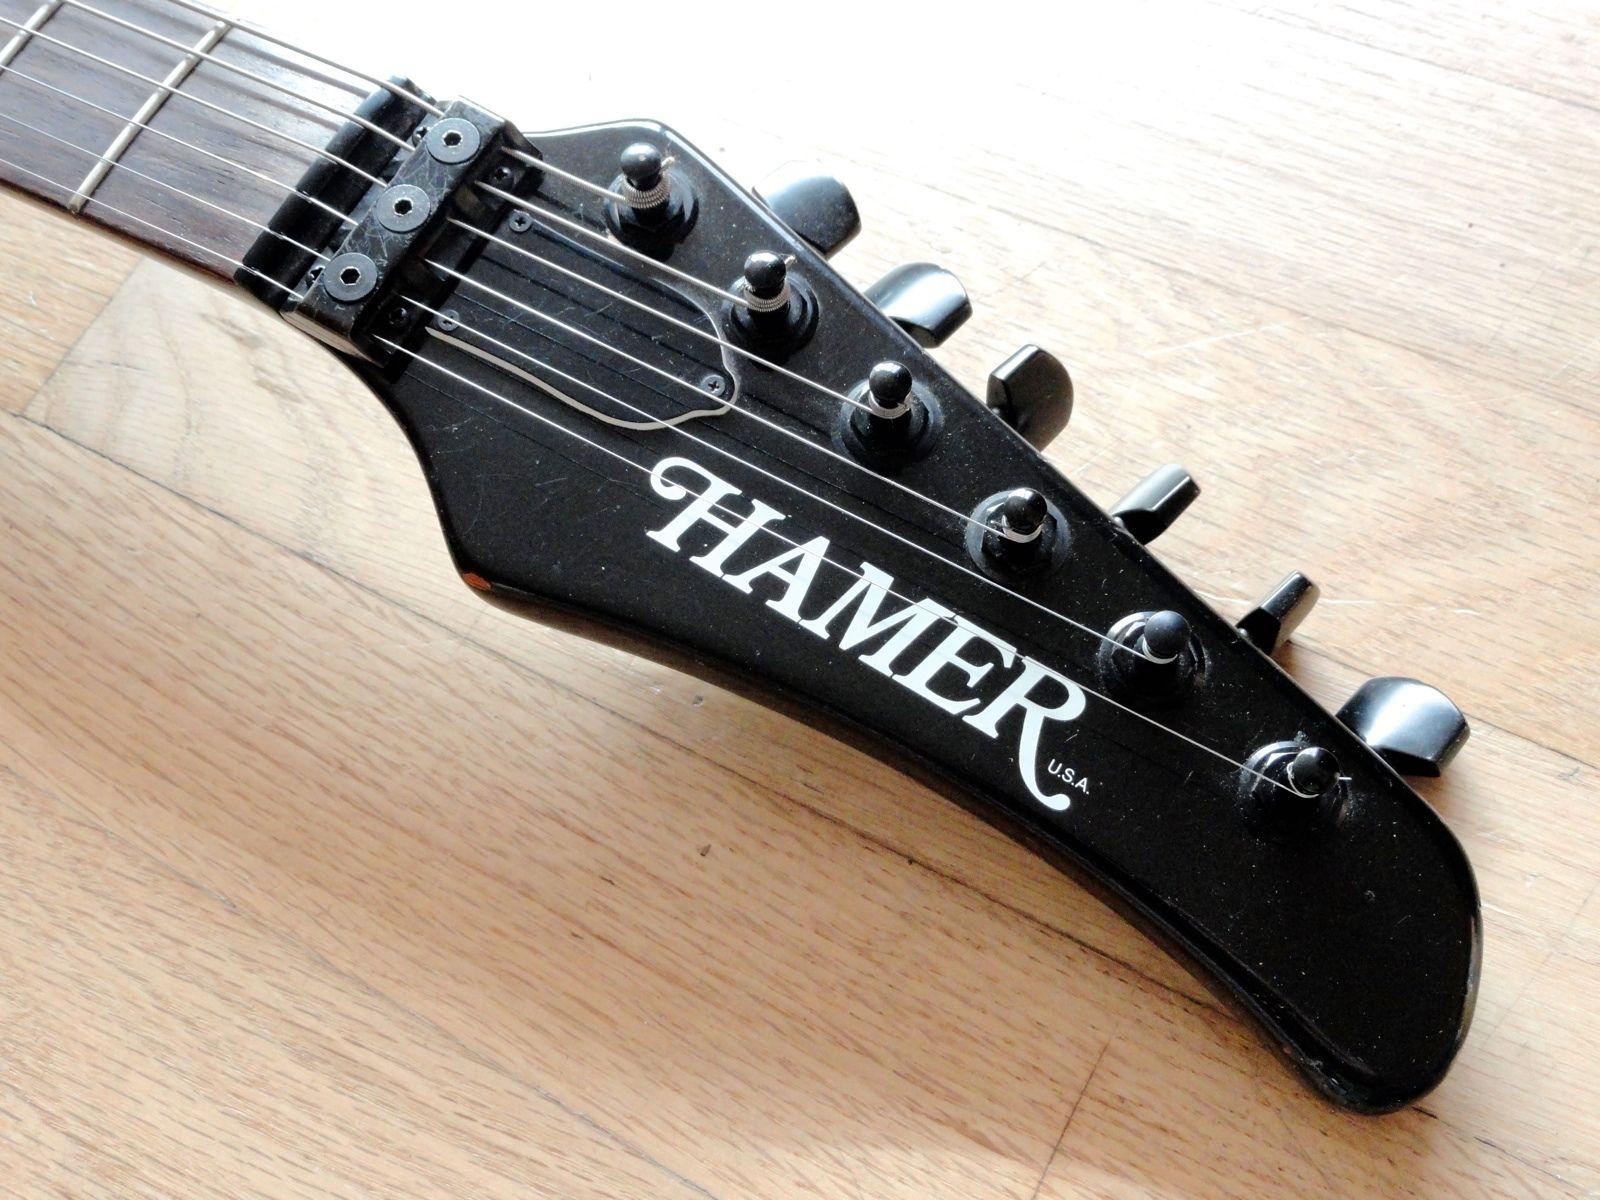 hamer a7 phantom vintage roland guitar synthesizer controller